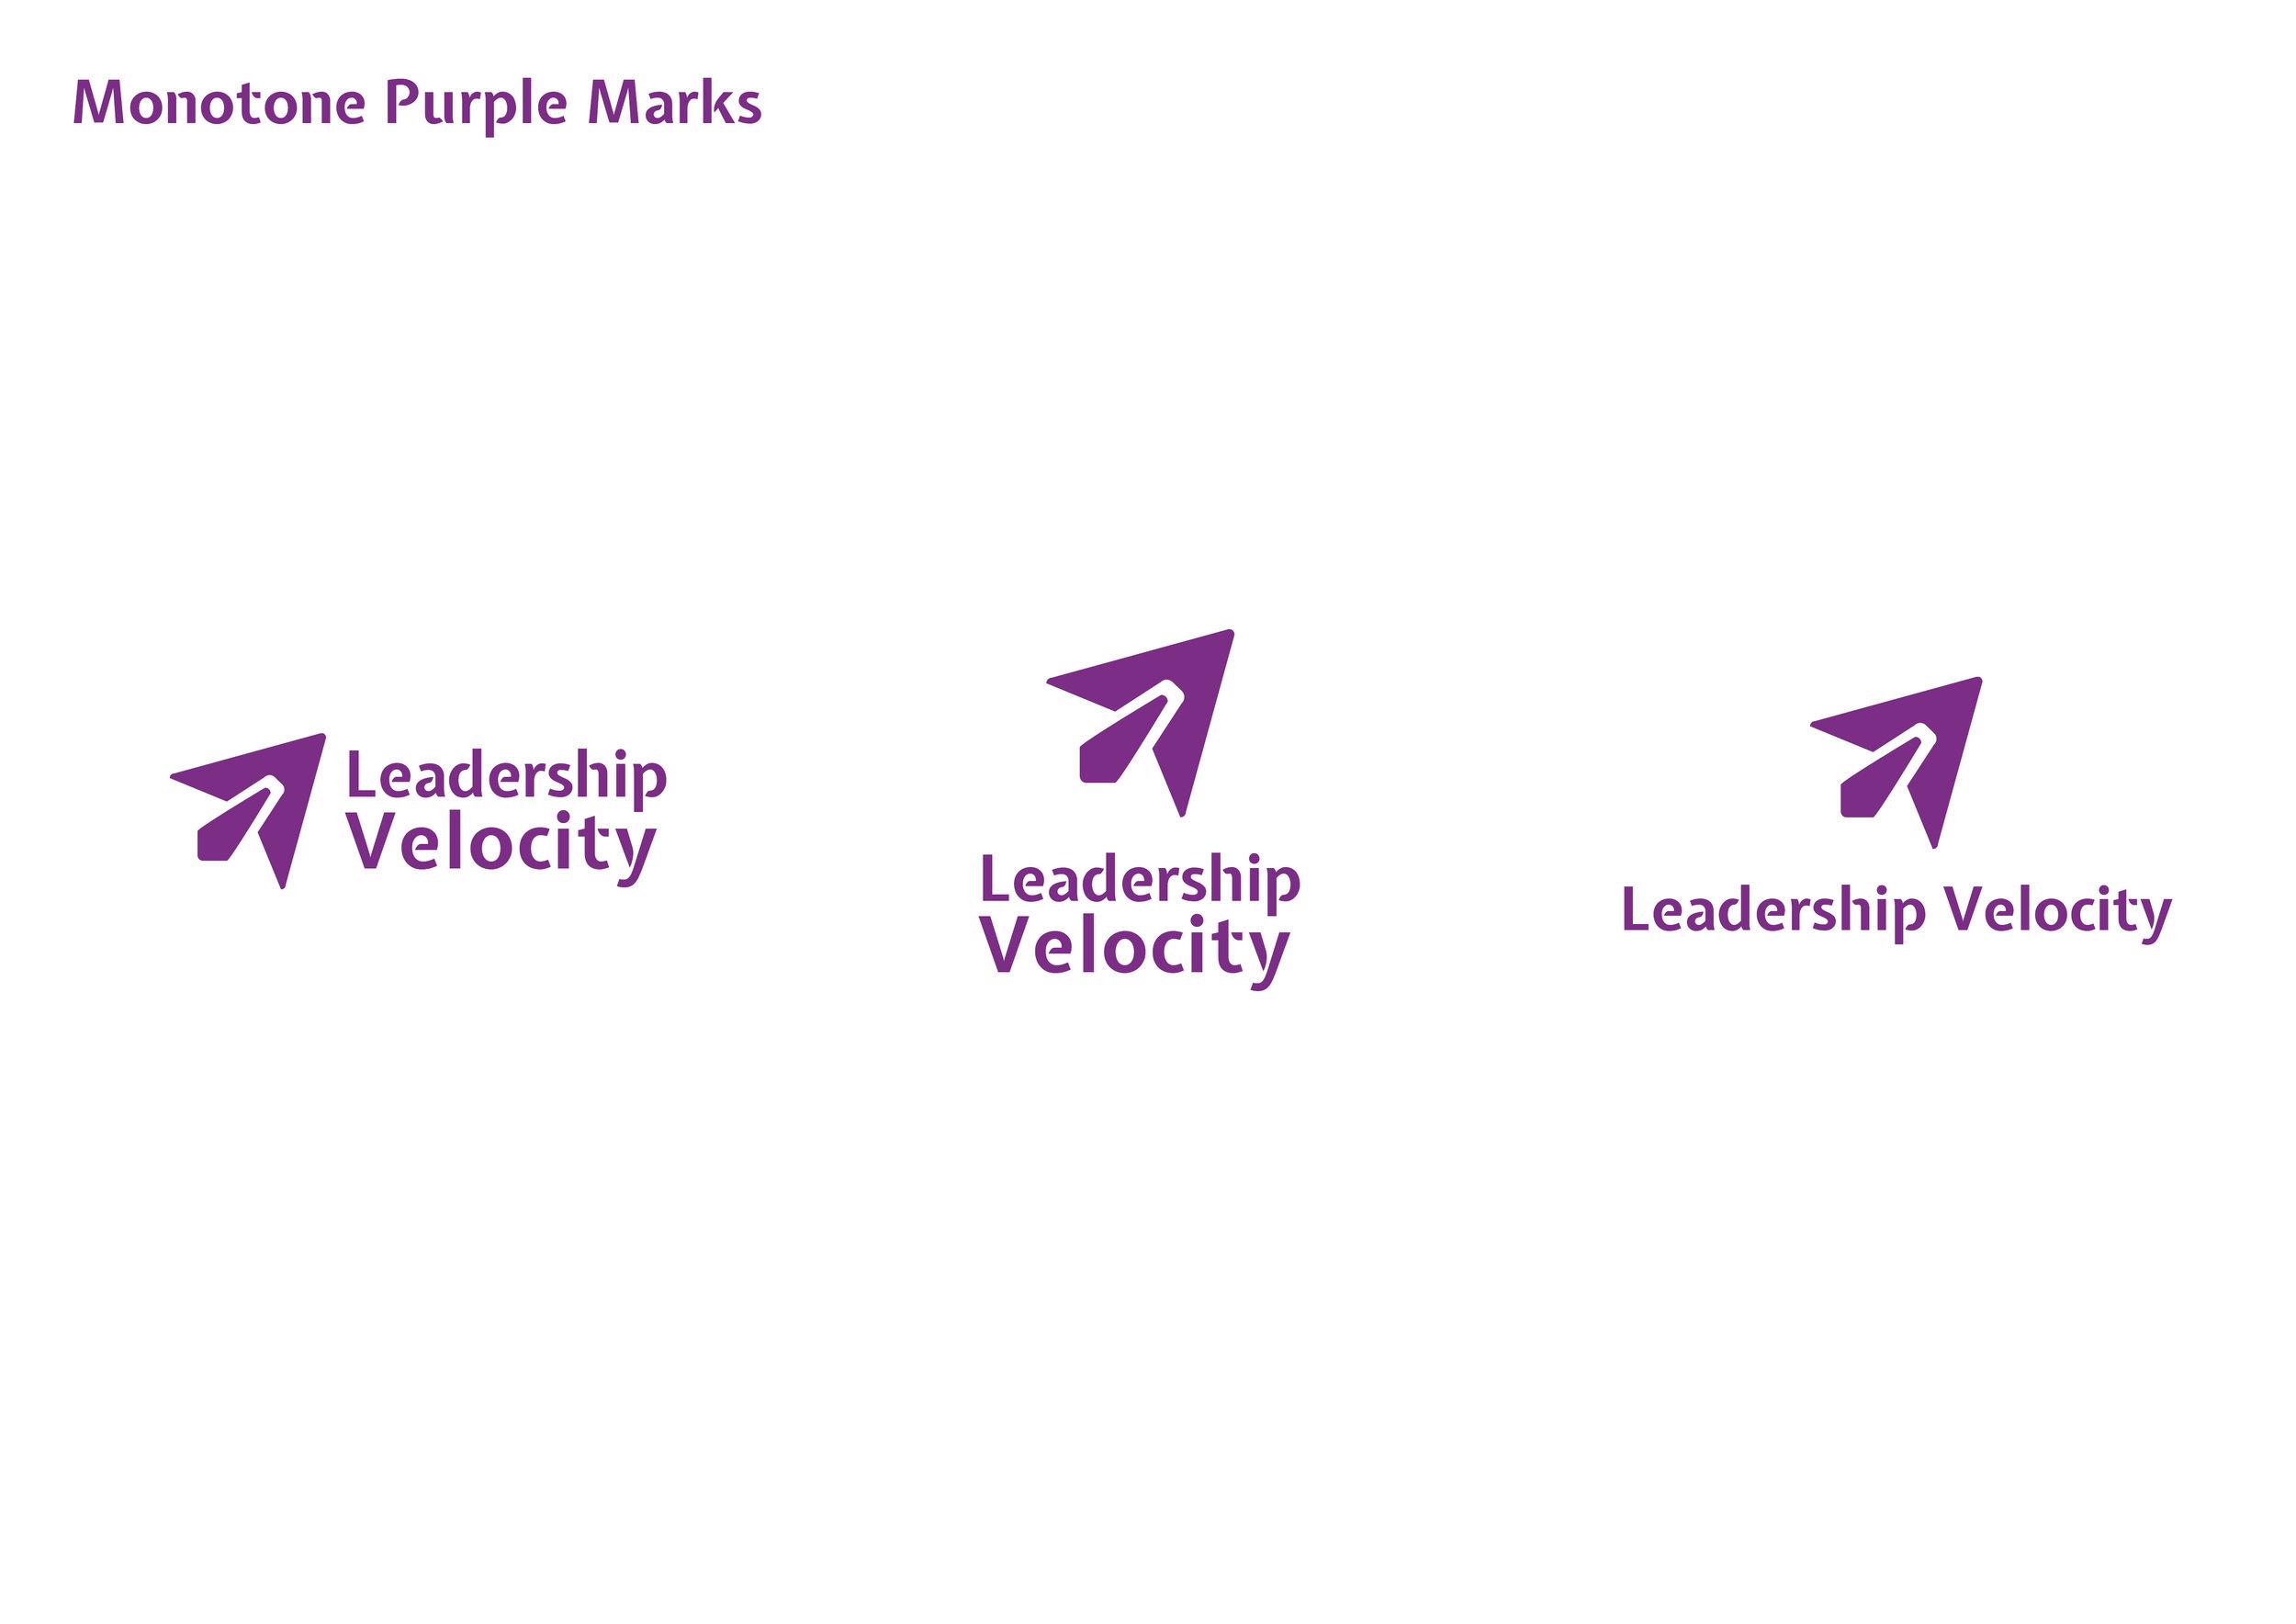 LeadershipVelocity_BrandIdentity_StyleGuide7.jpg